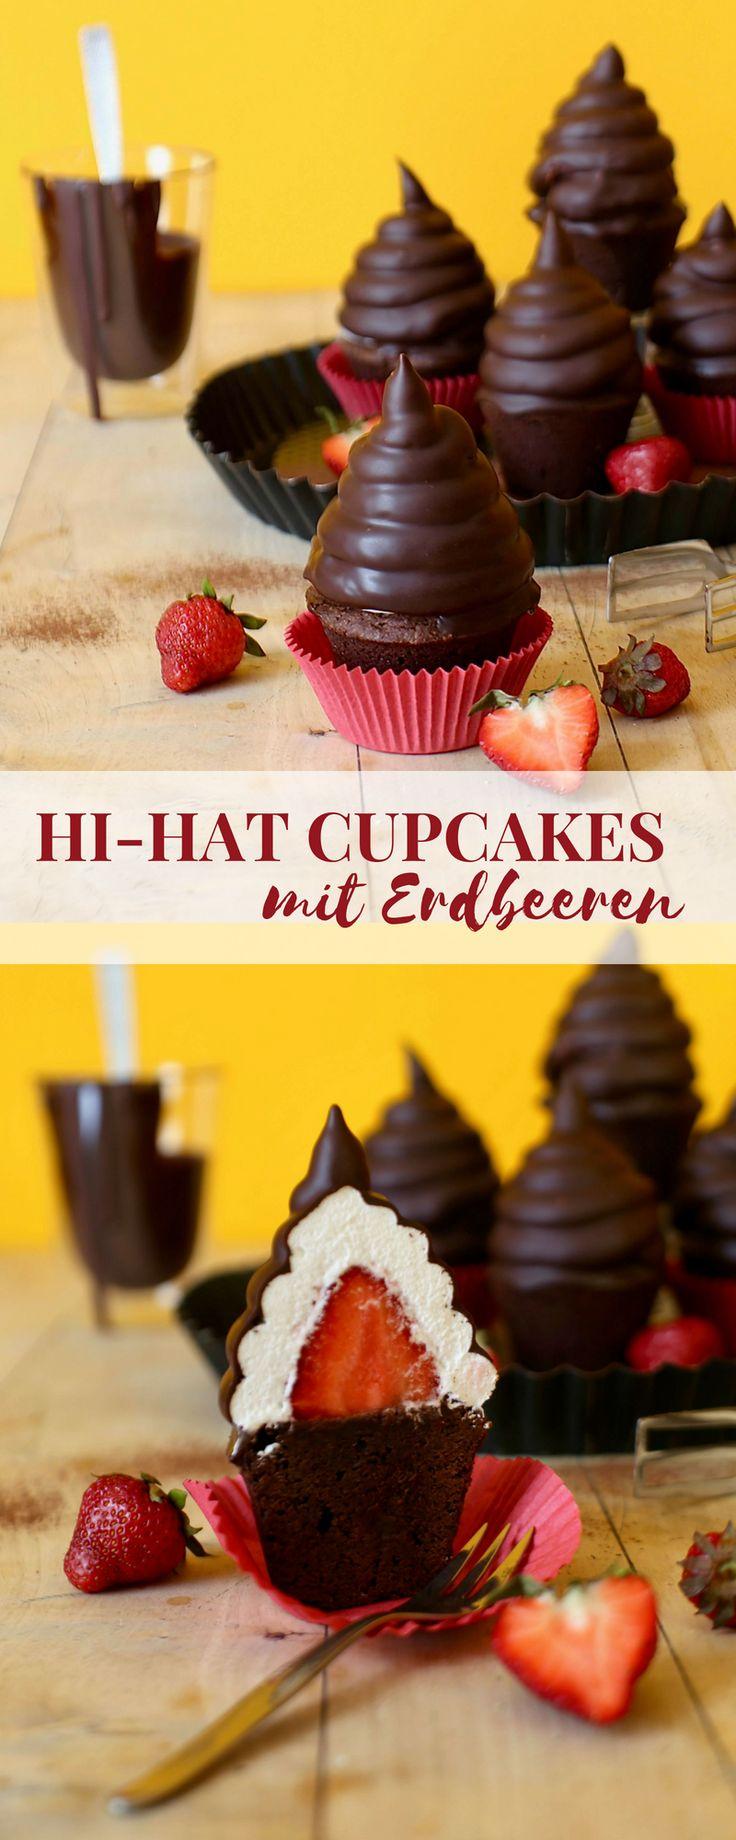 Brownie Hi-Hat Cupcakes mit Erdbeeren